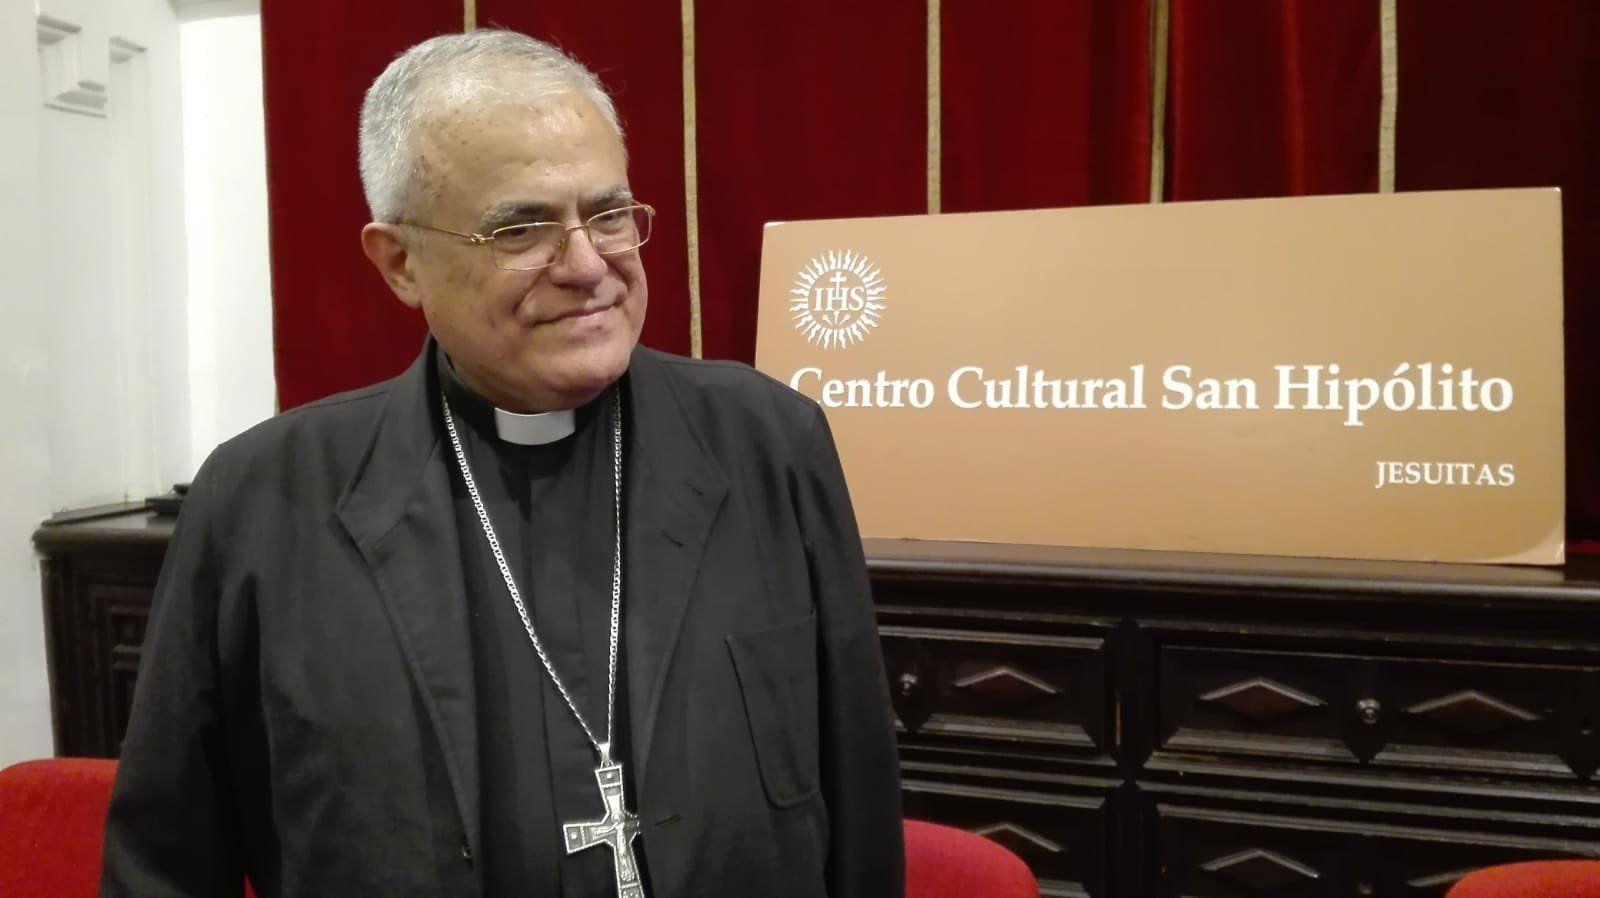 Obispo de Córdoba sobre los inmigrantes